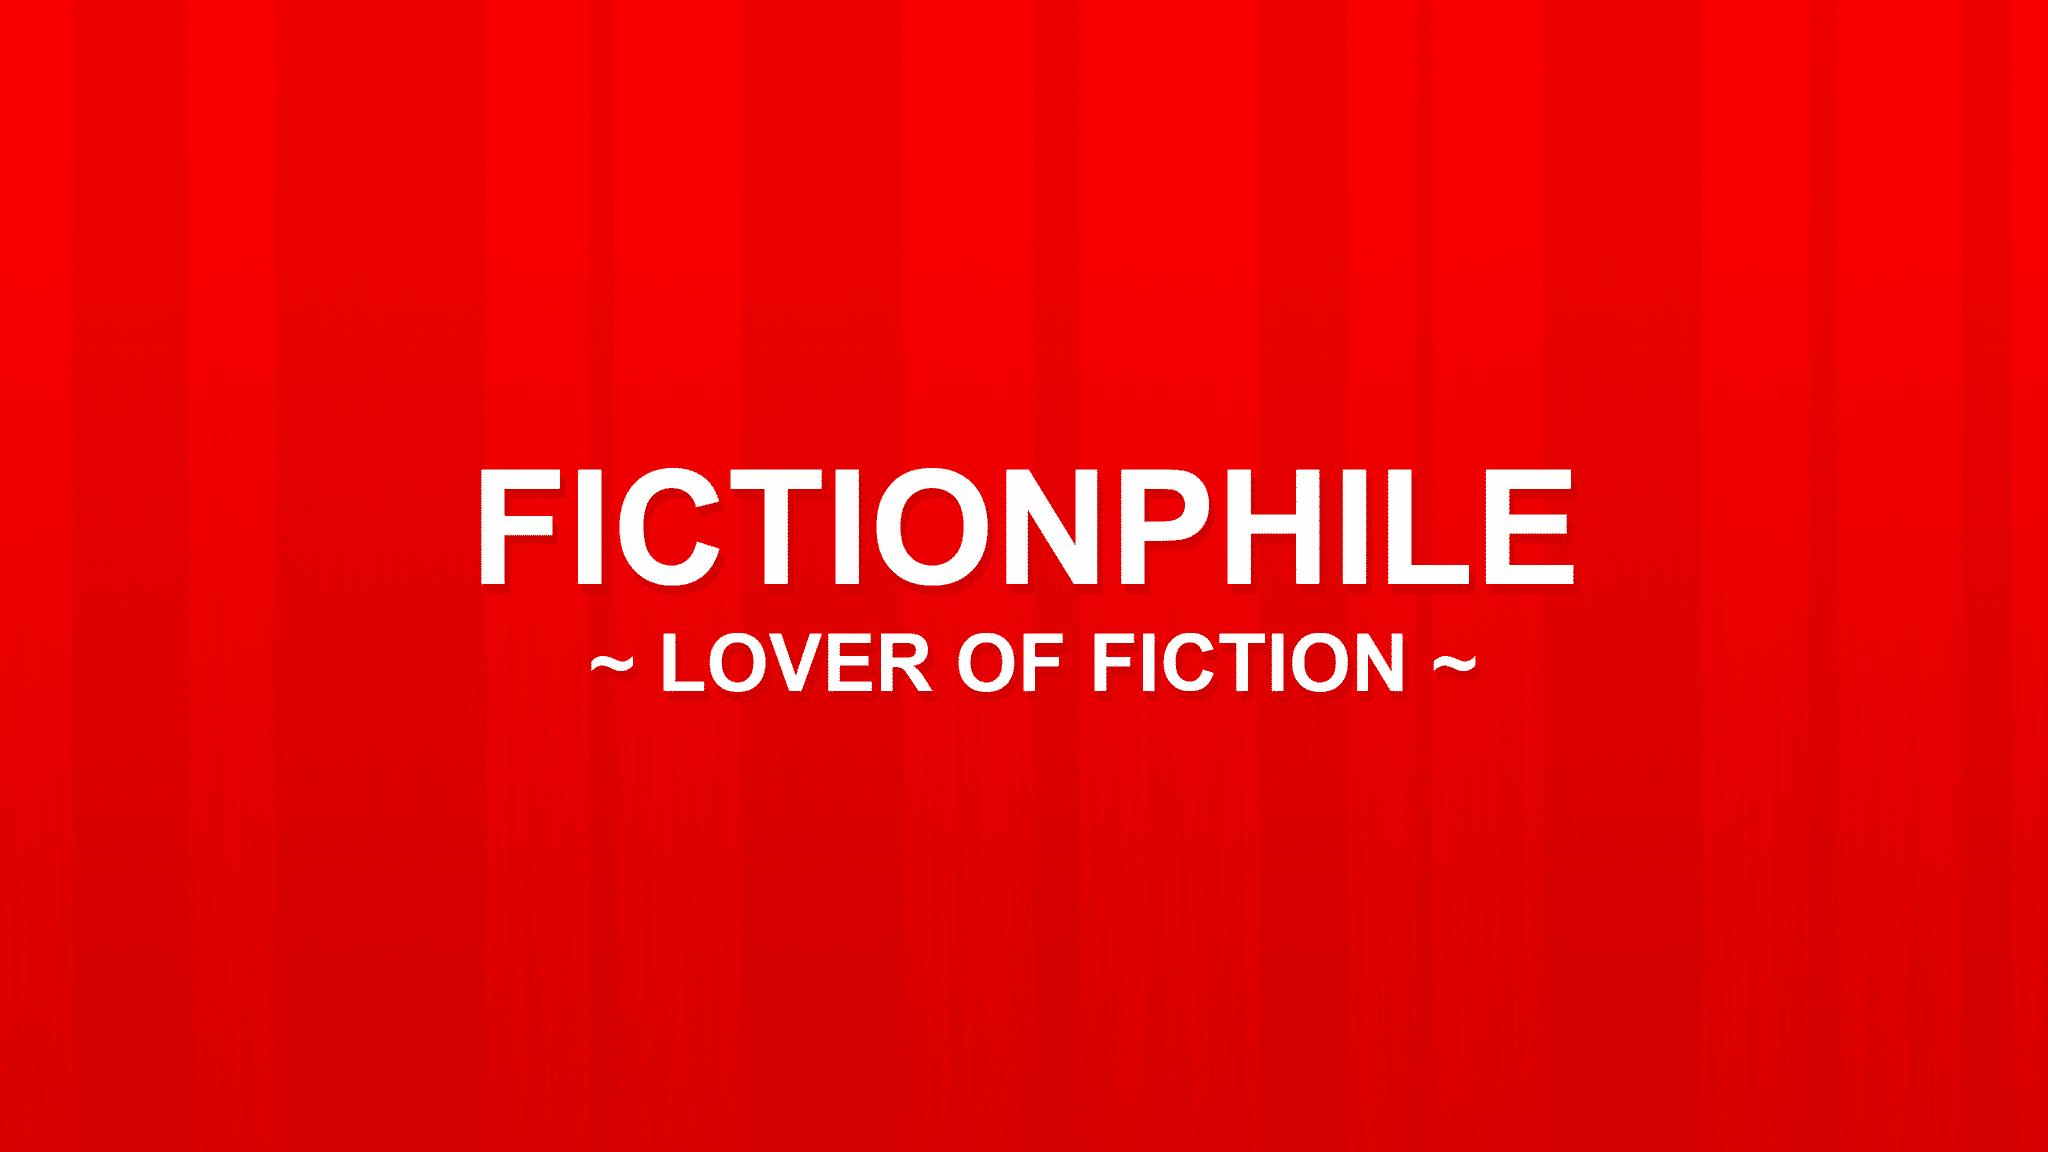 fictionphile staff